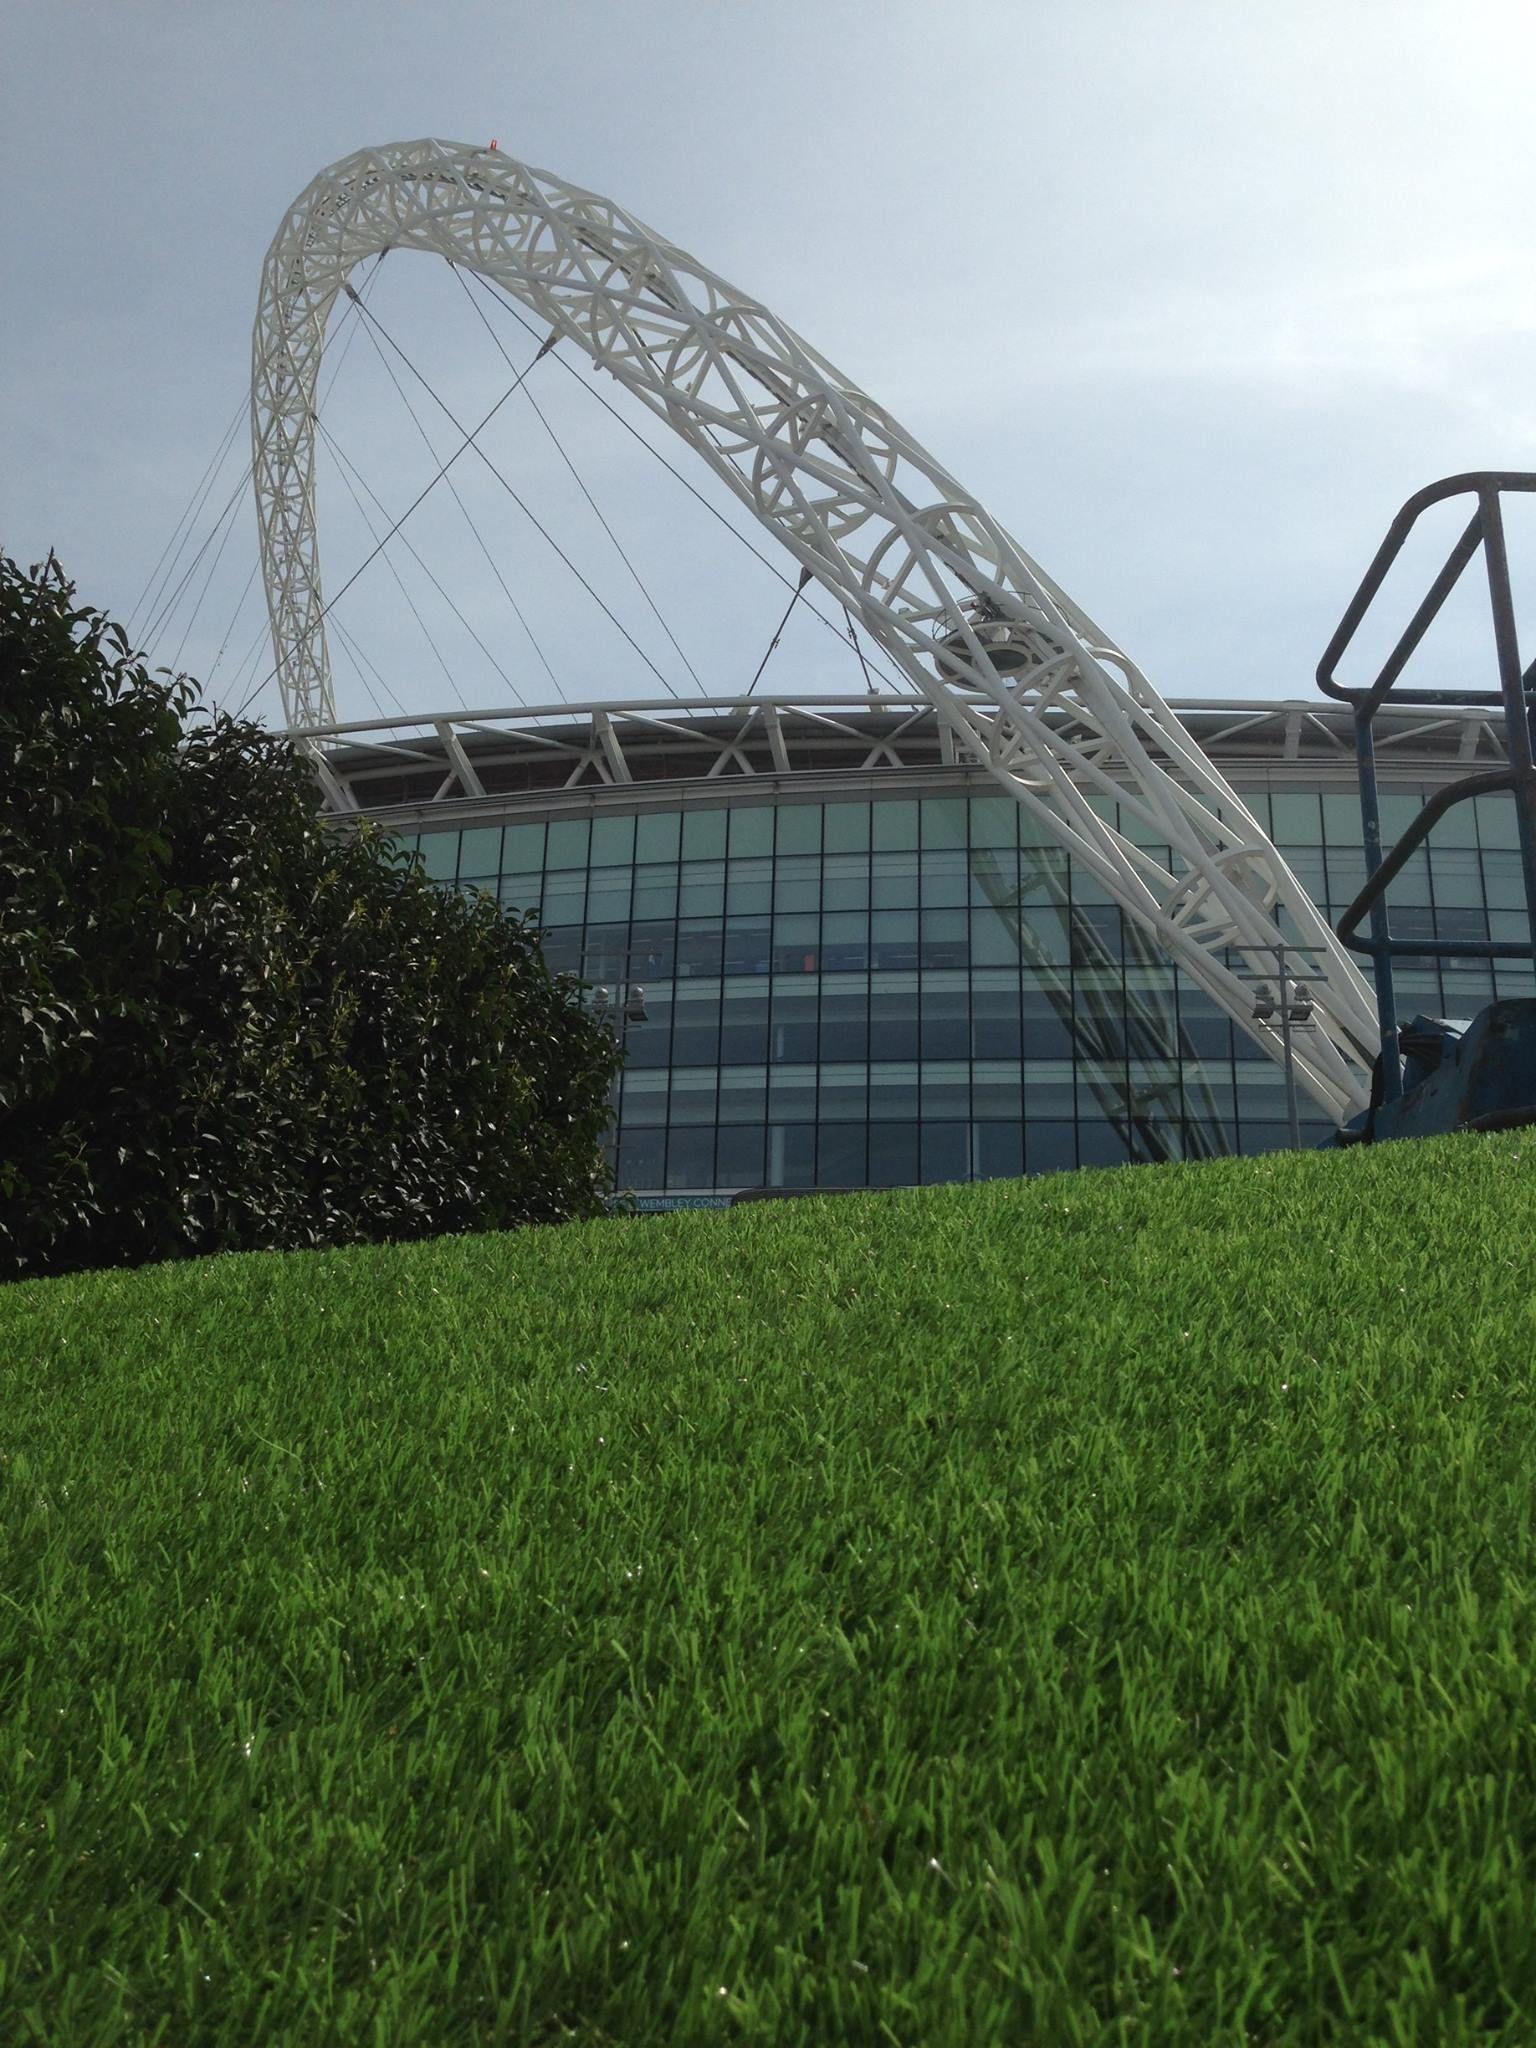 Nomow Artificial Grass at #WembleyStadium brand new for Spring 2014! #Nomow #Play365